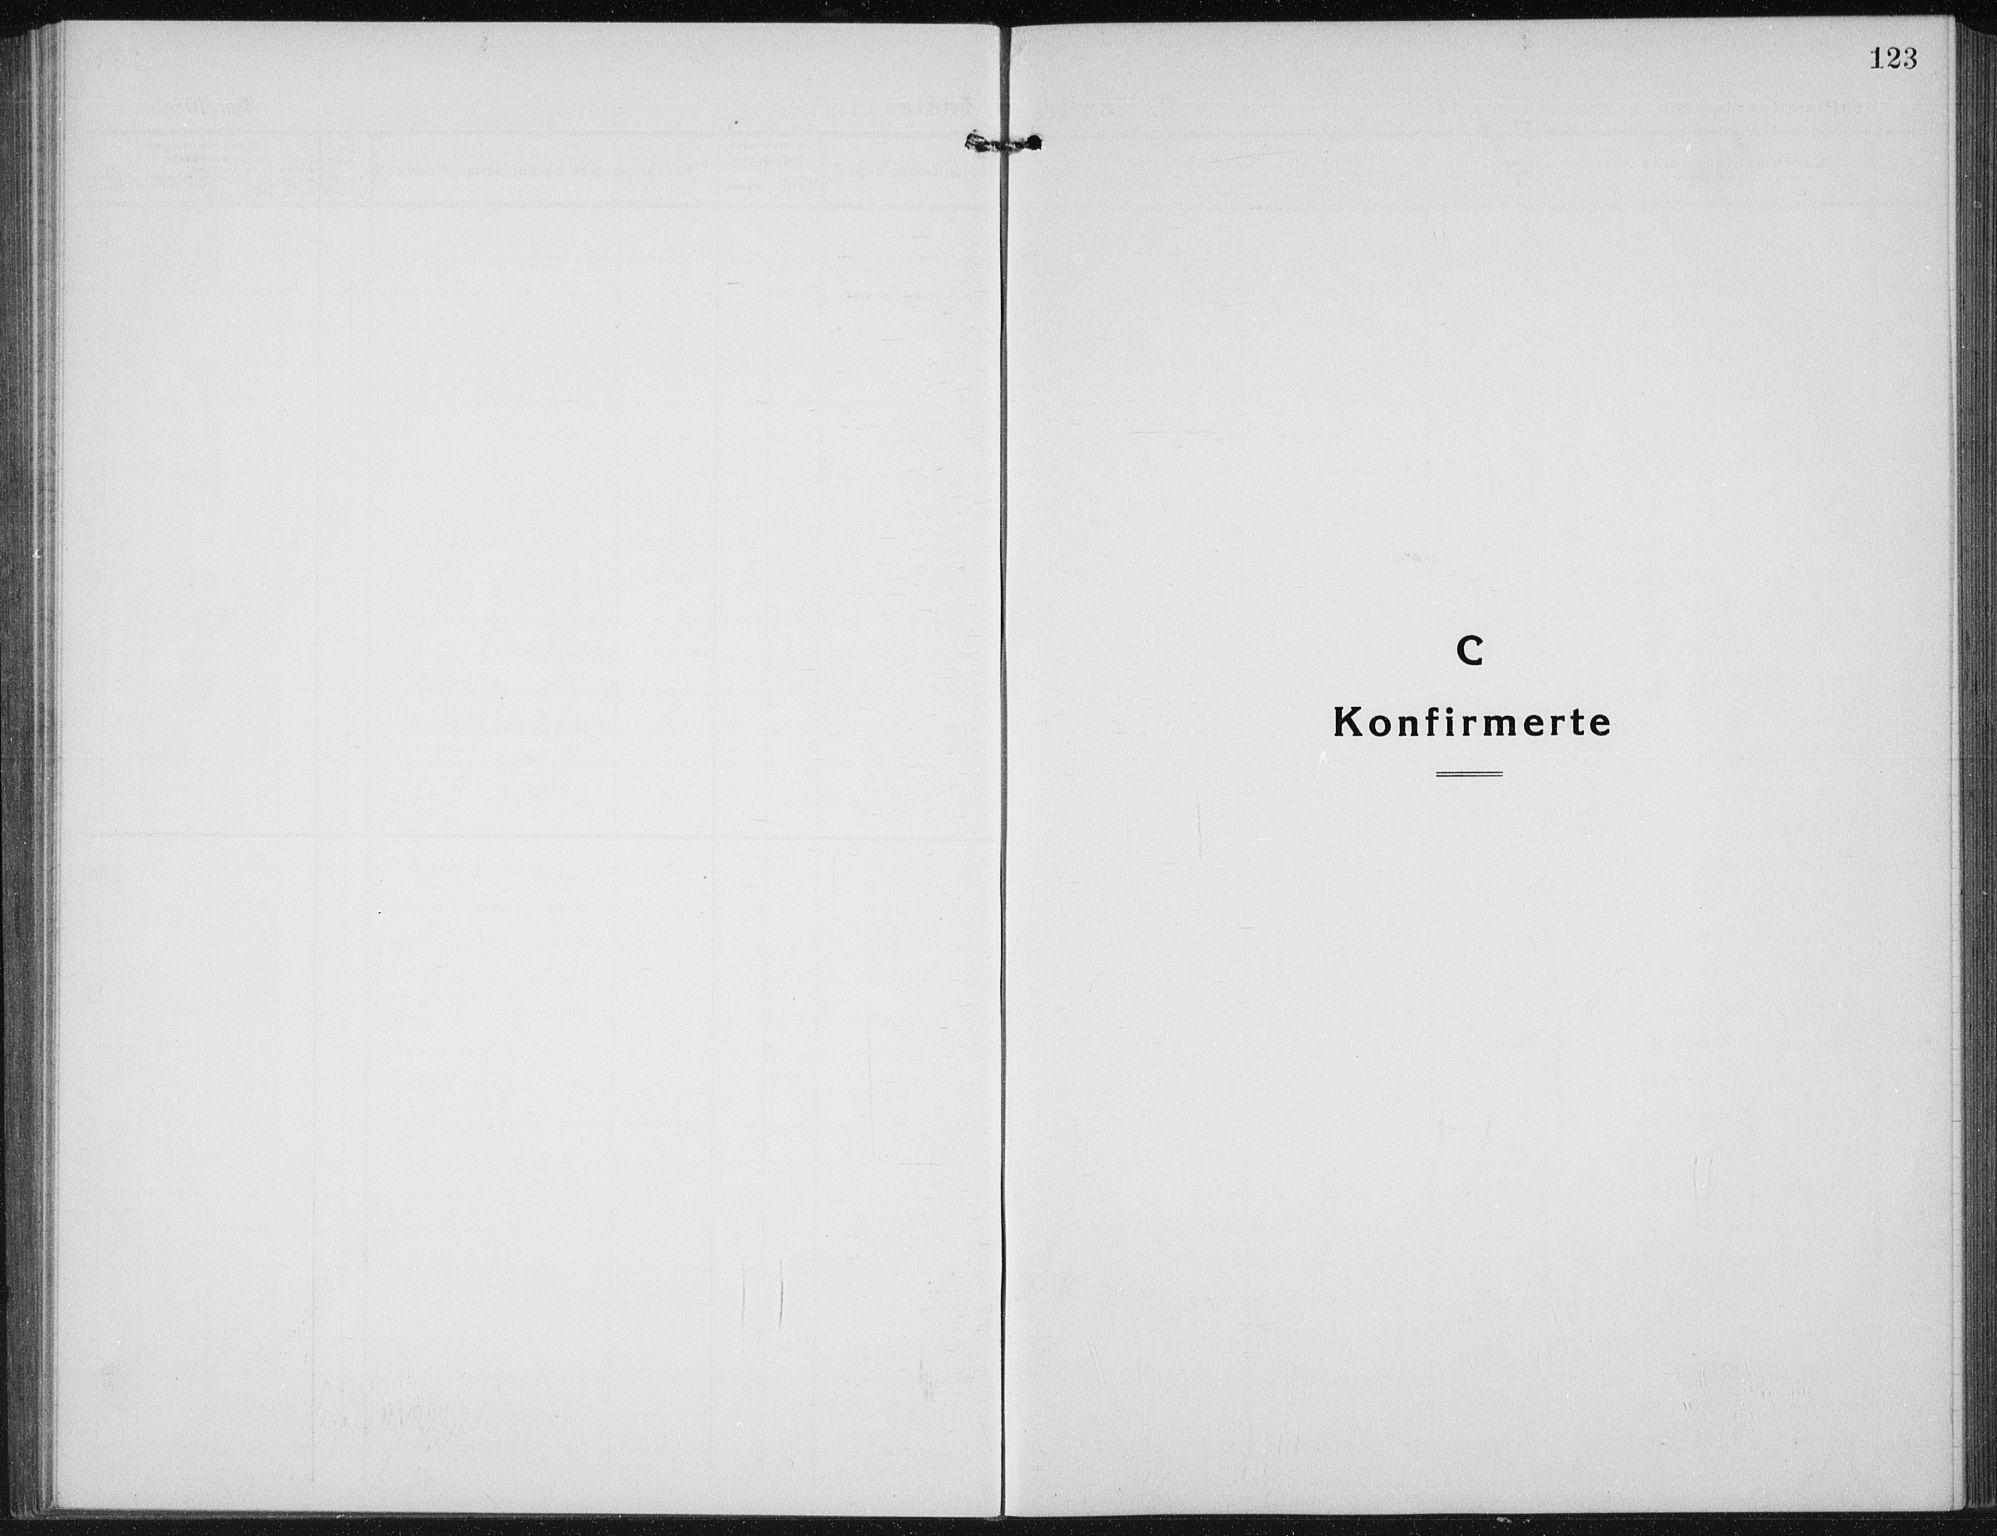 SAH, Vardal prestekontor, H/Ha/Hab/L0017: Klokkerbok nr. 17, 1922-1941, s. 123